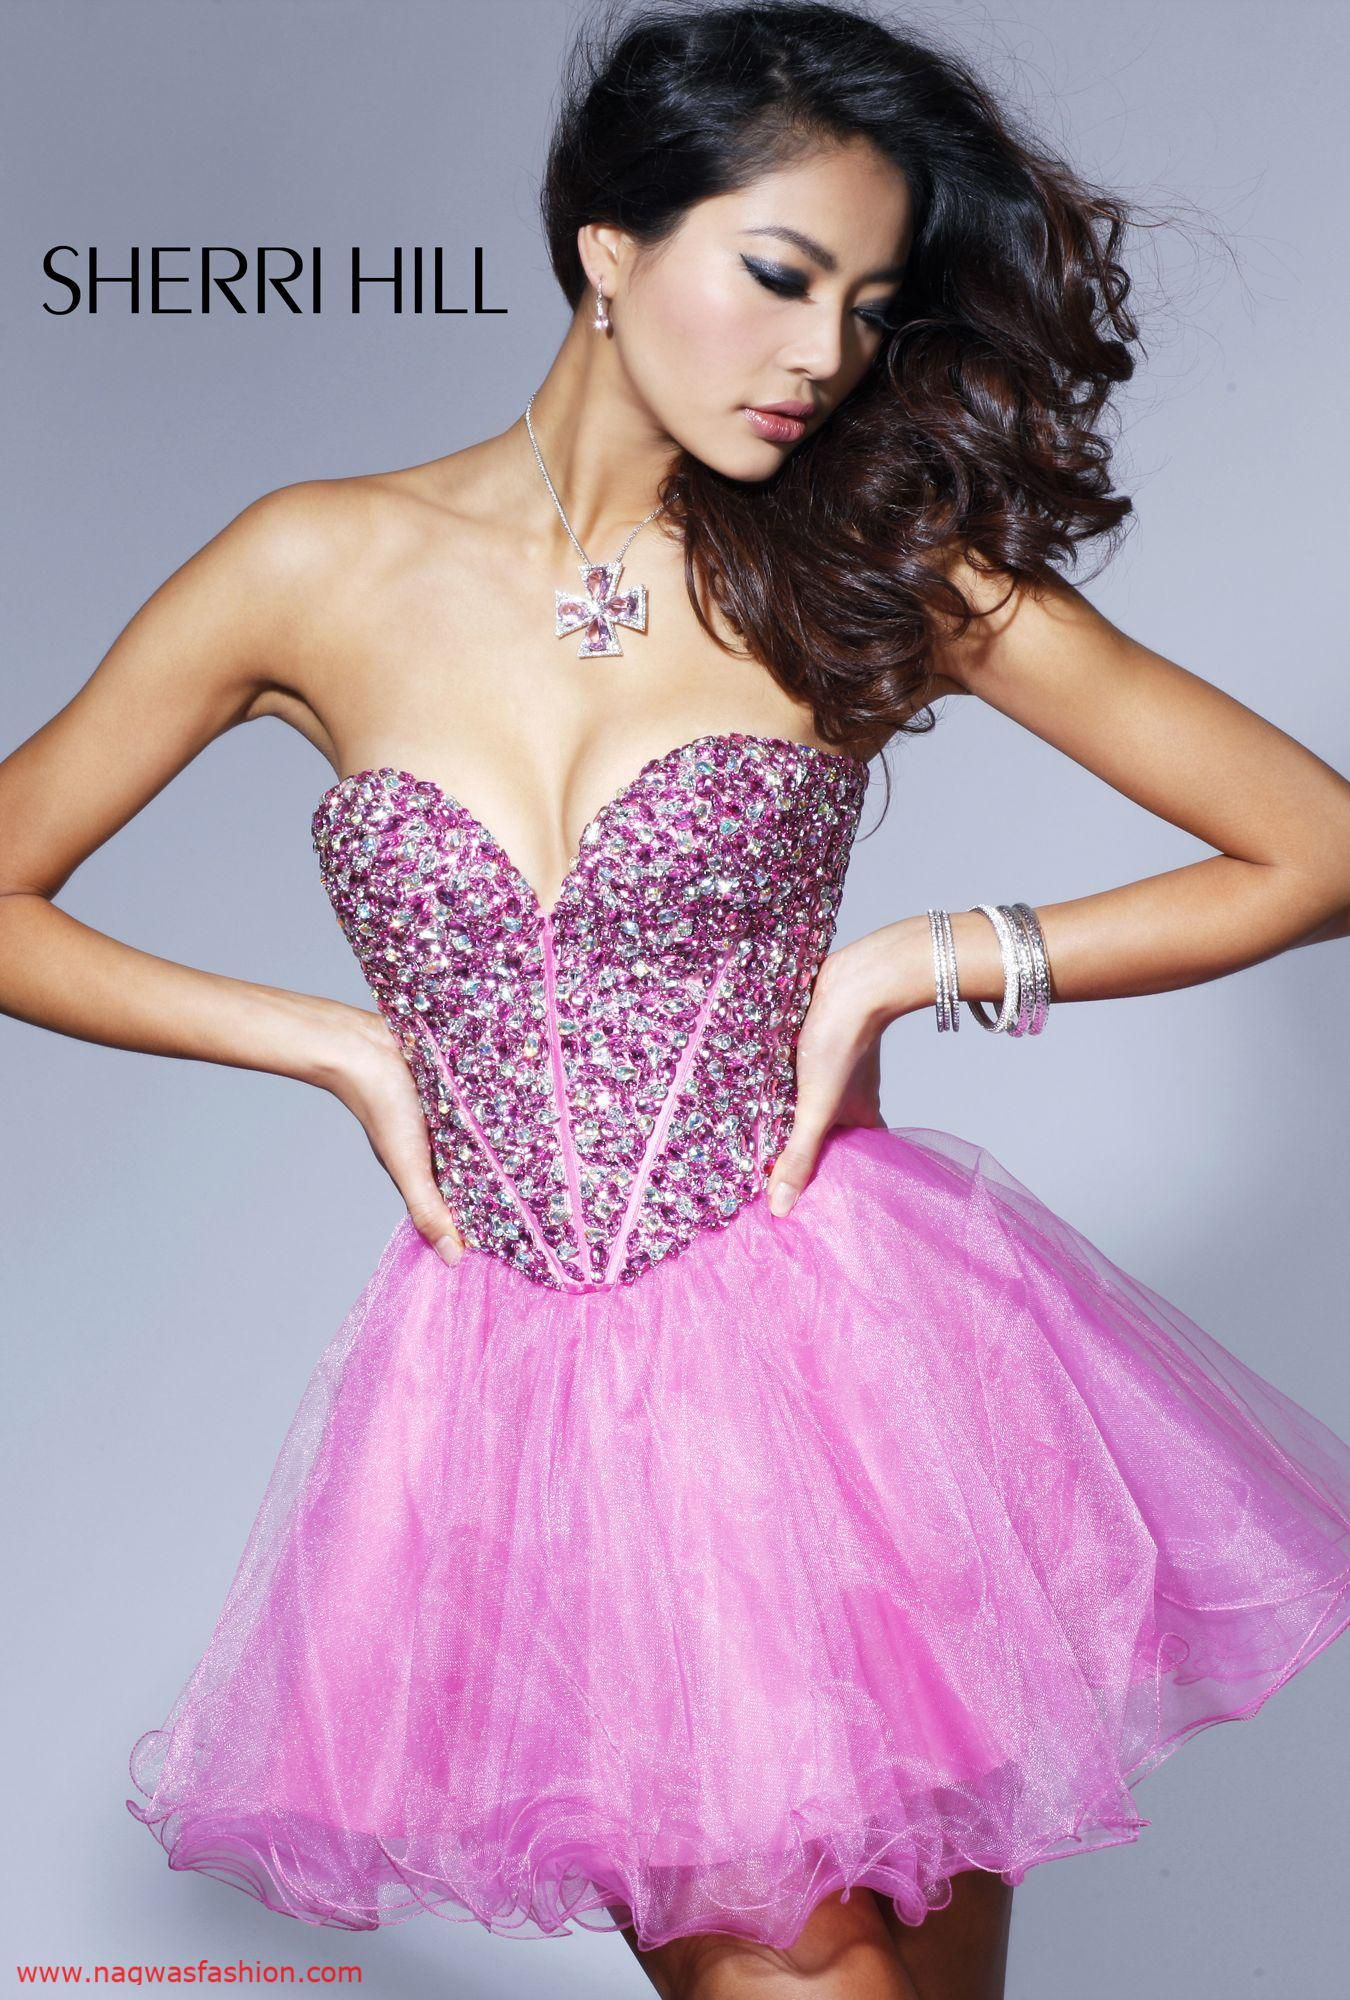 Pin de Marissa Gracia en Fashion | Pinterest